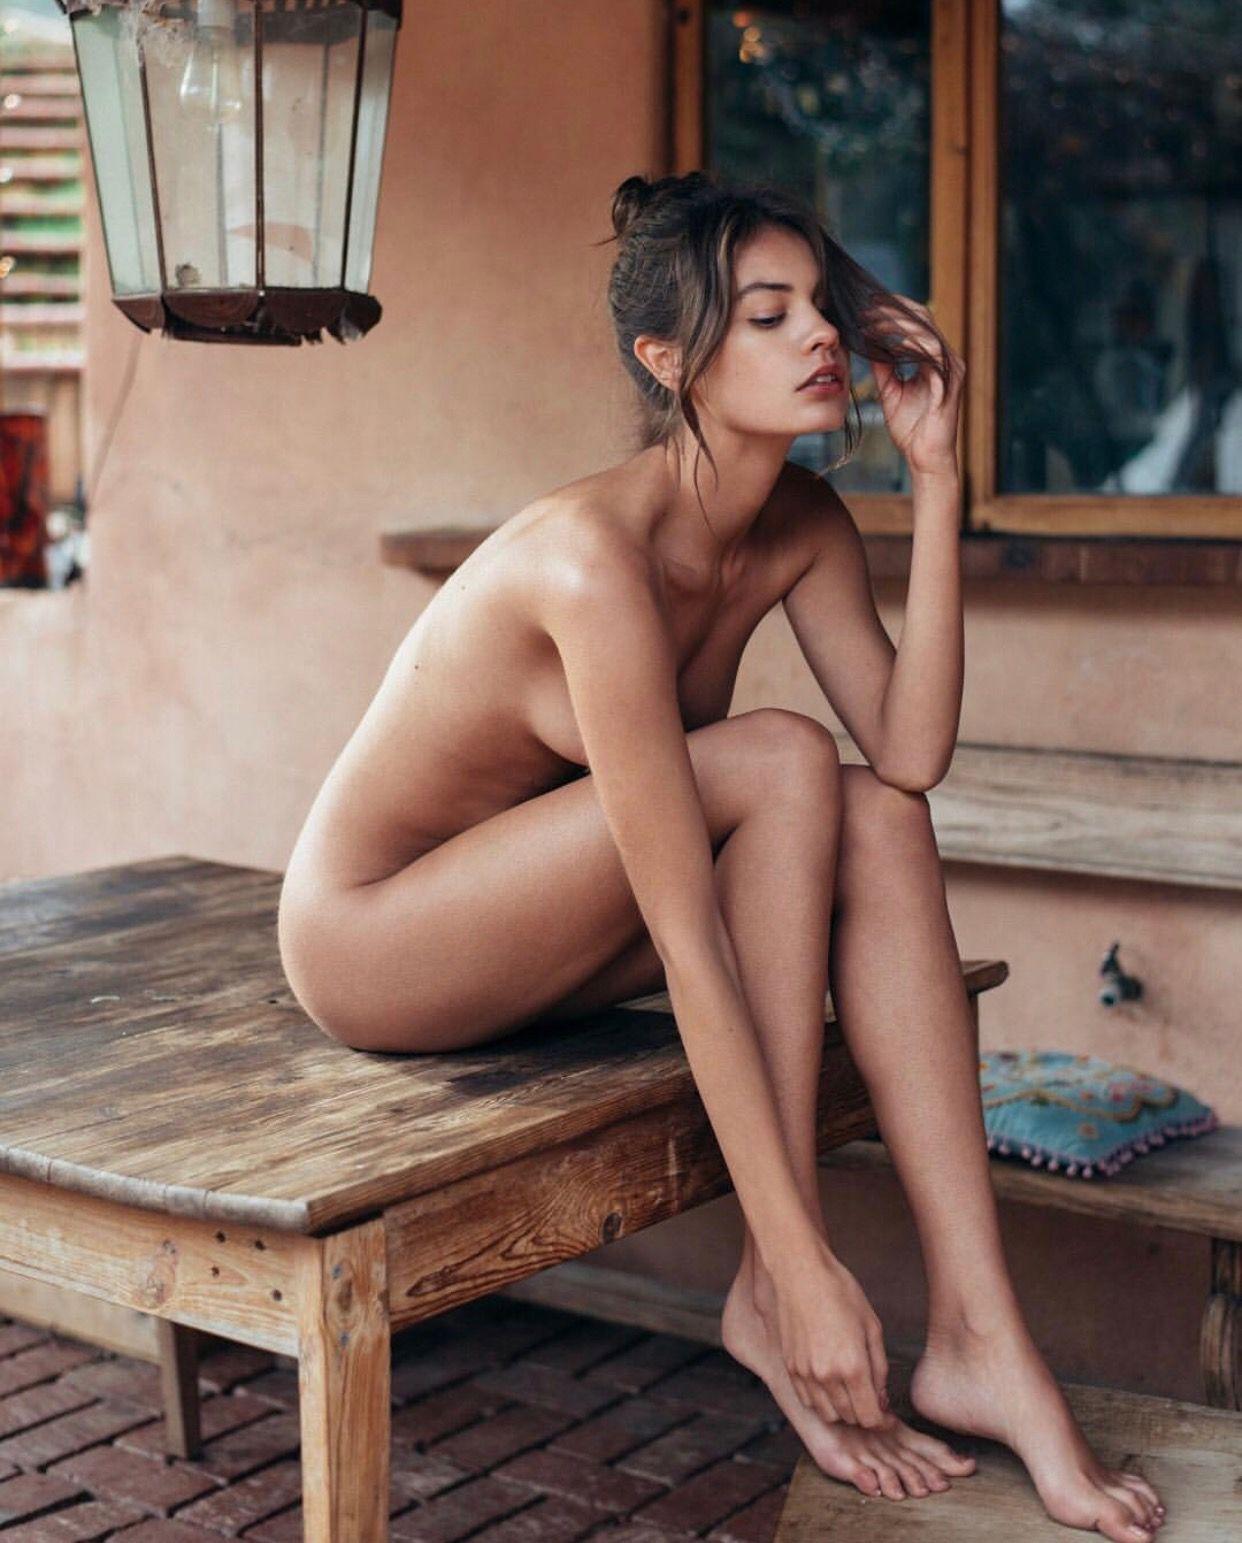 Selfie Beate Muska nude photos 2019